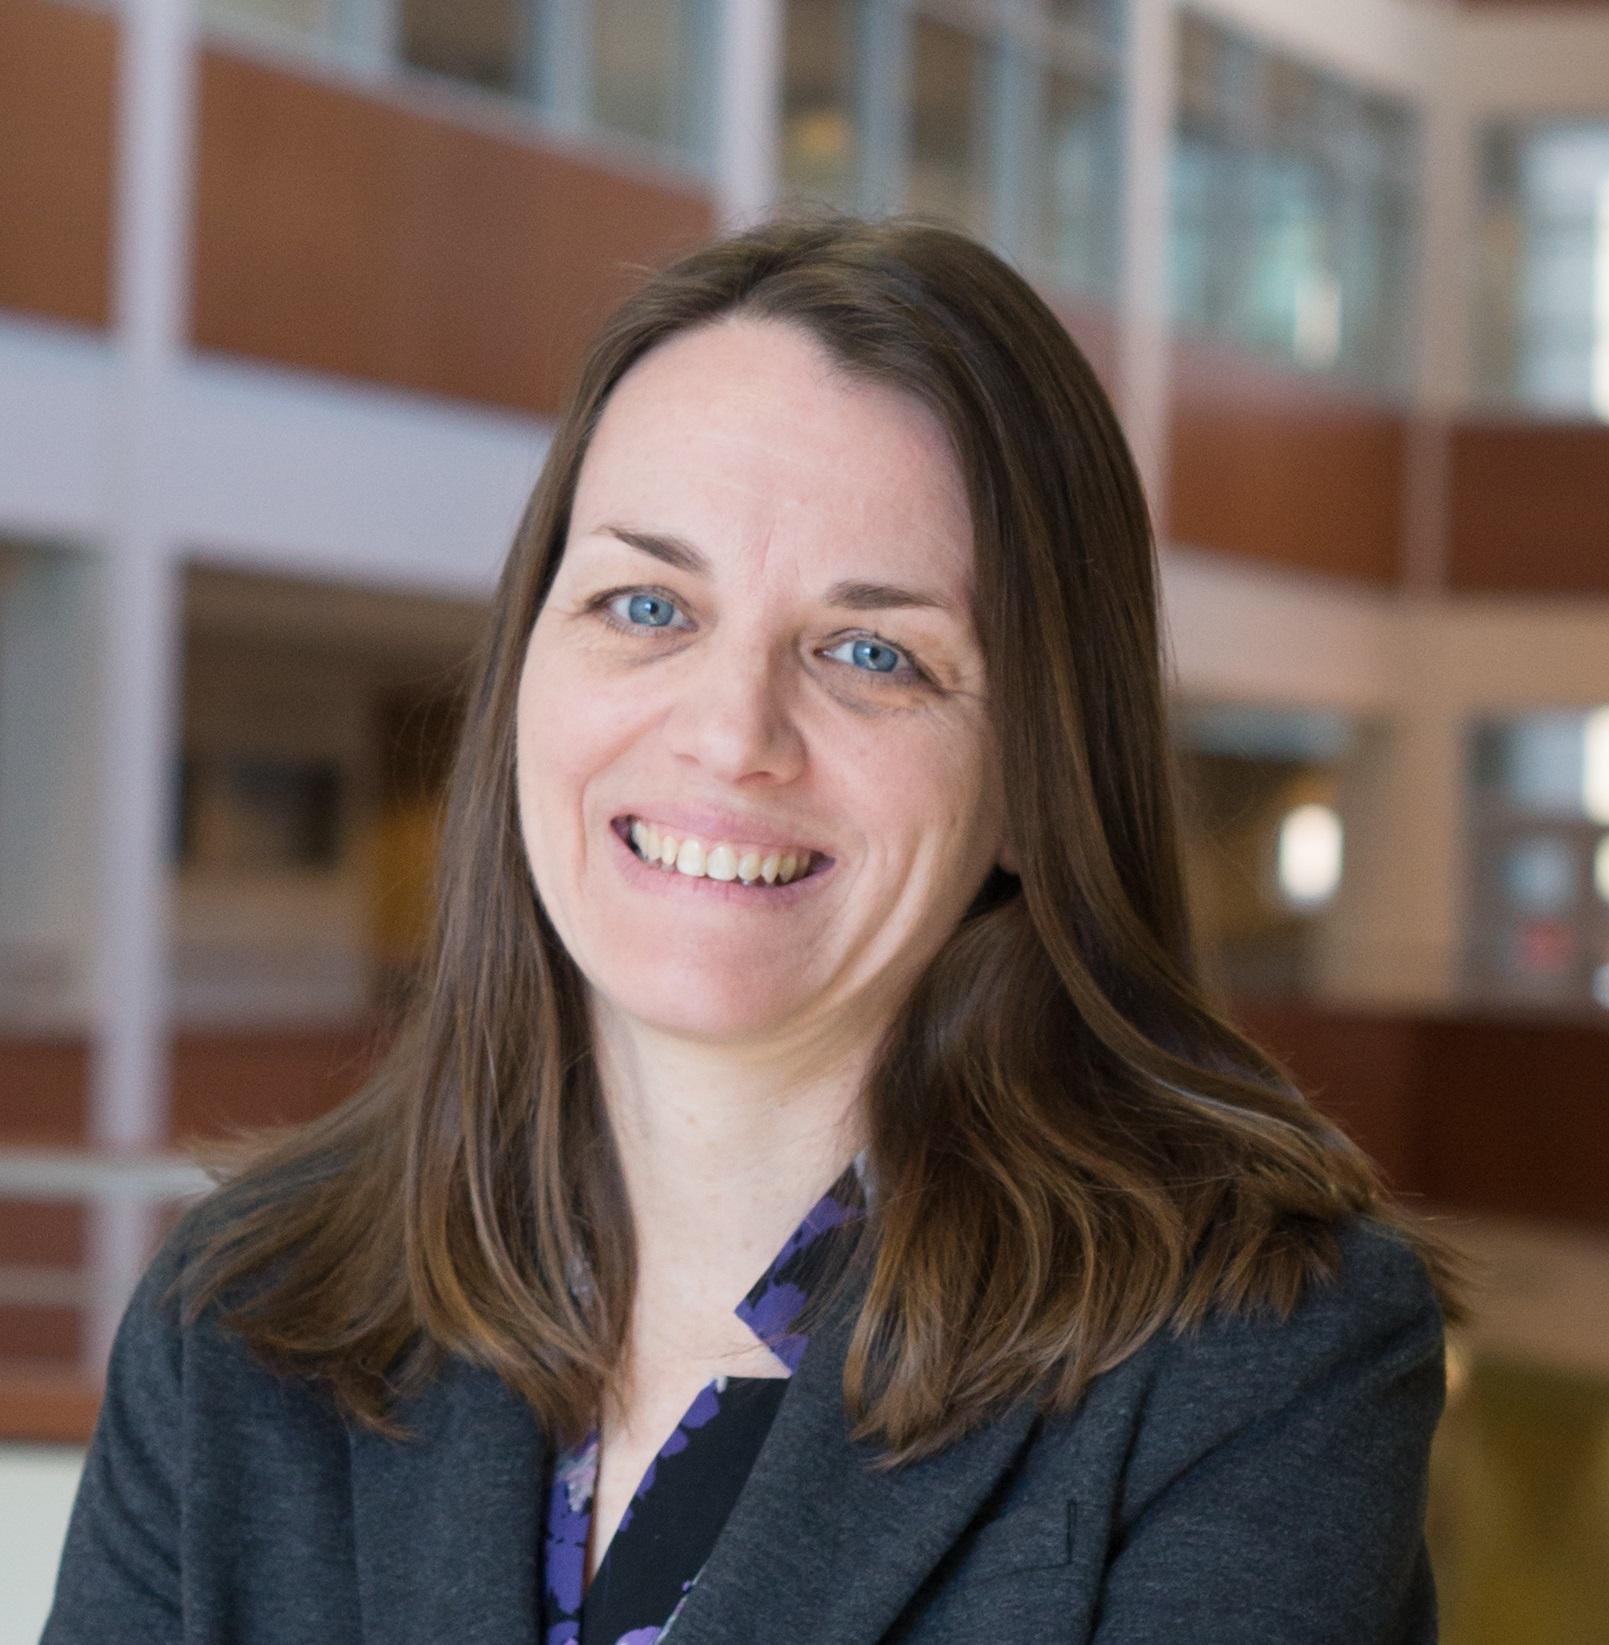 Dr. Amy Trentham-Dietz